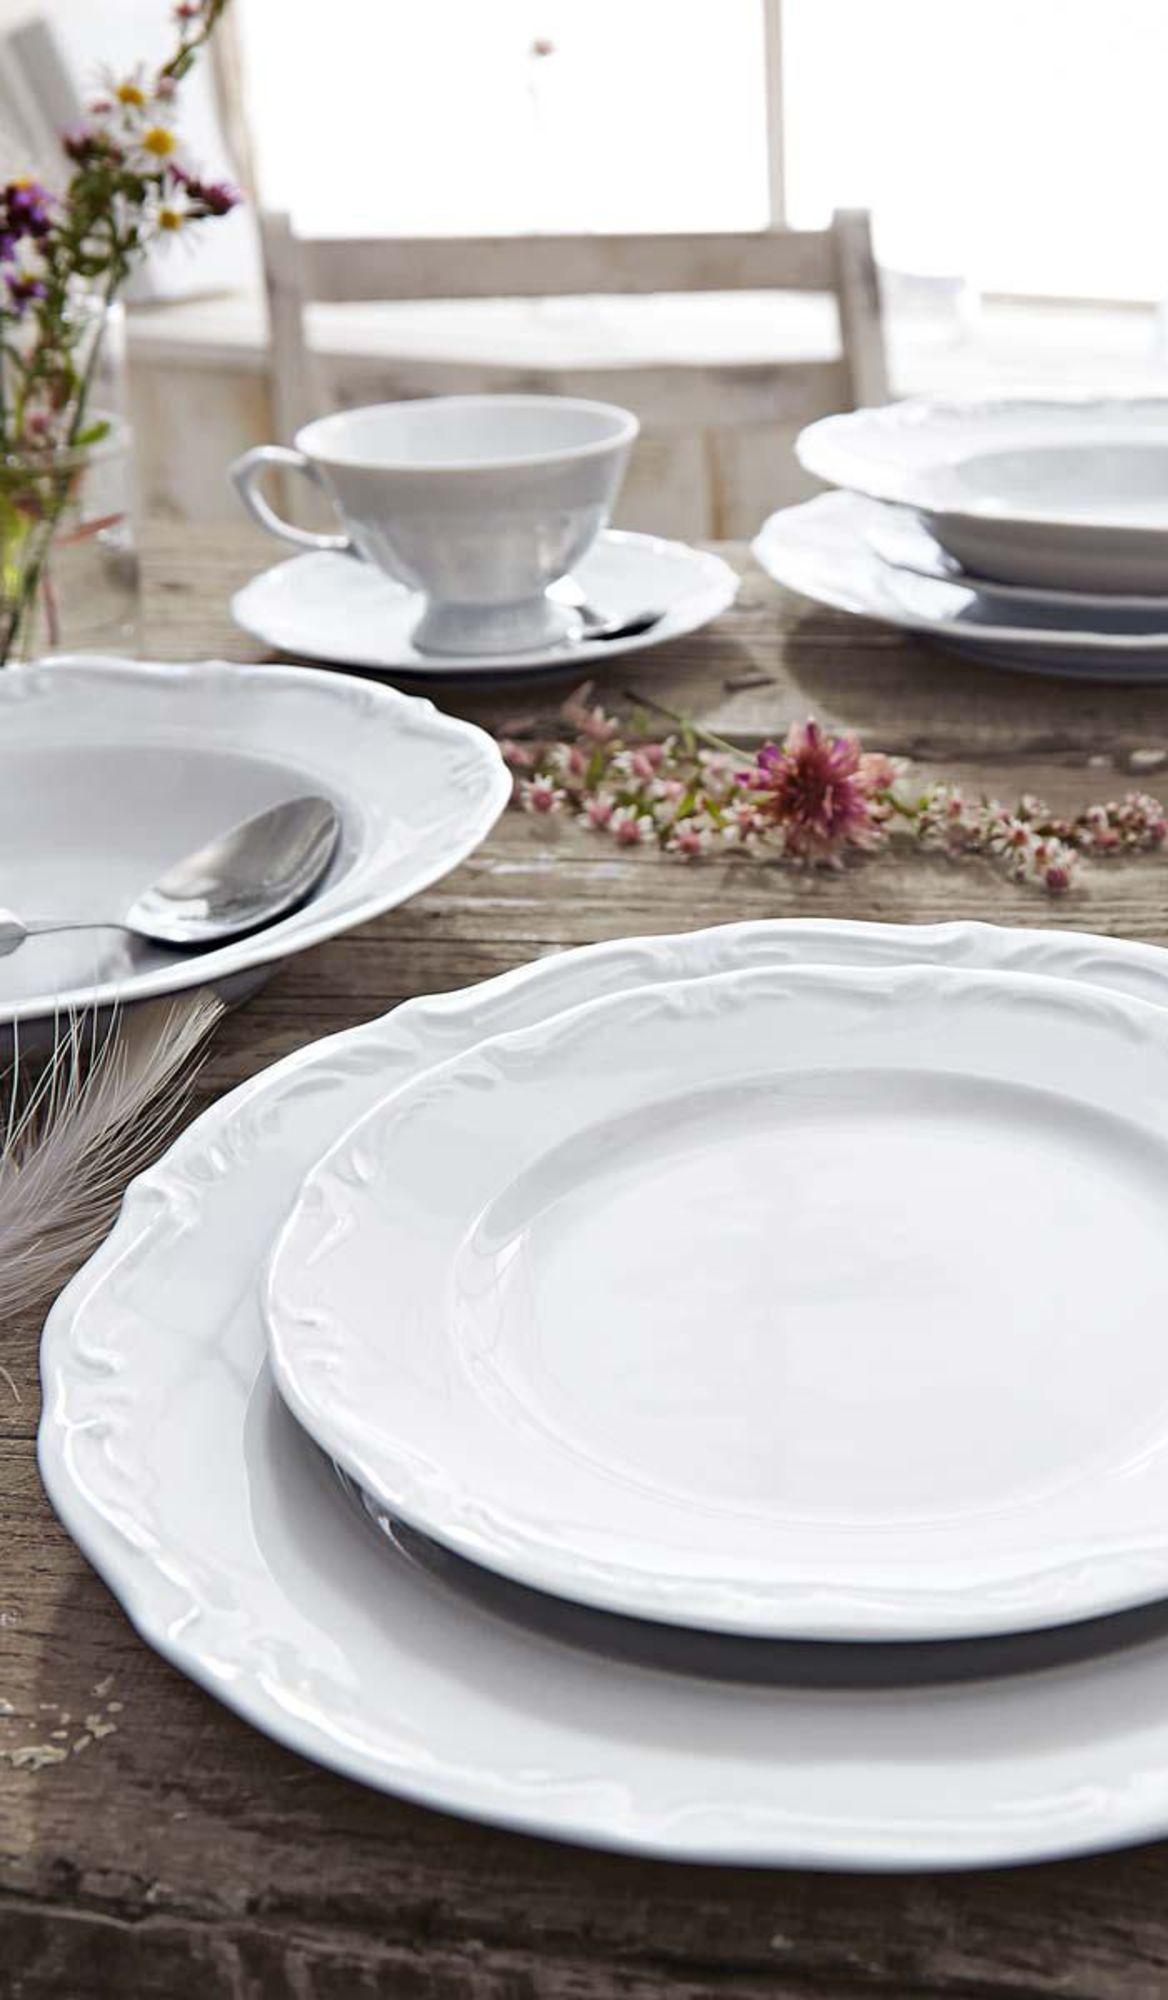 12 Tlg Romantisches Tafelservice Aus Porzellan Geschirr Landhausstil Tafelservice Geschirrset